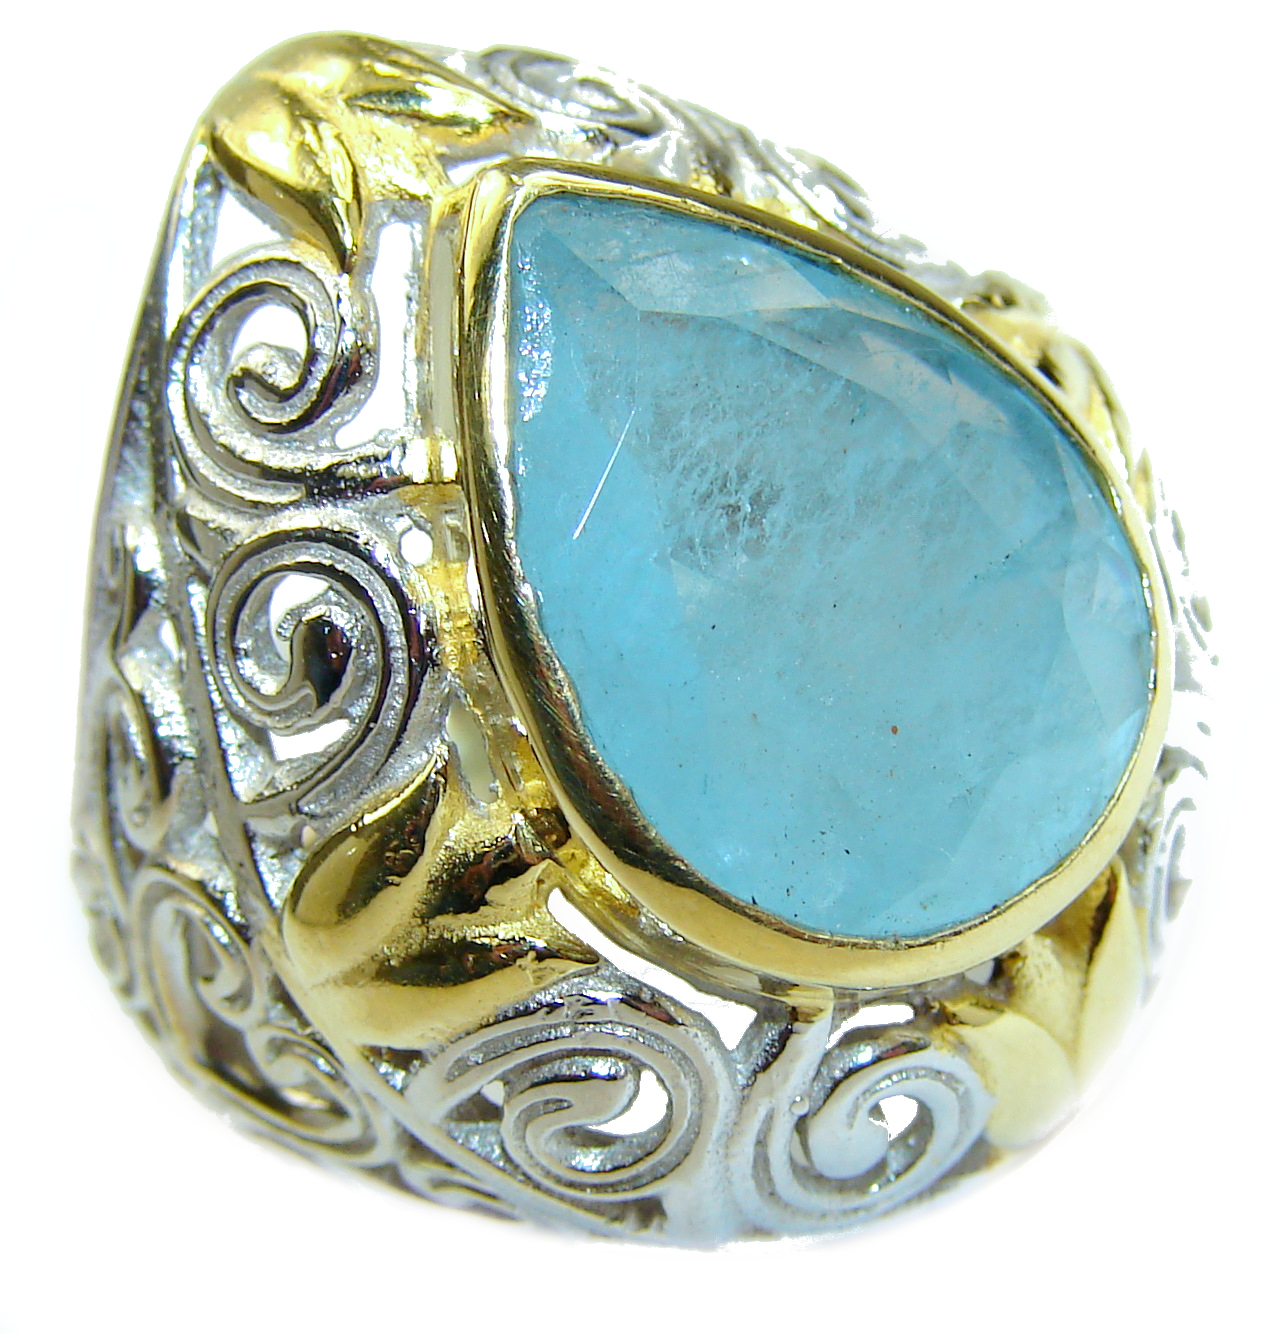 Spectacular genuine Aquamarine 14K Gold over .925 Sterling Silver handmade ring s. 7 1/4